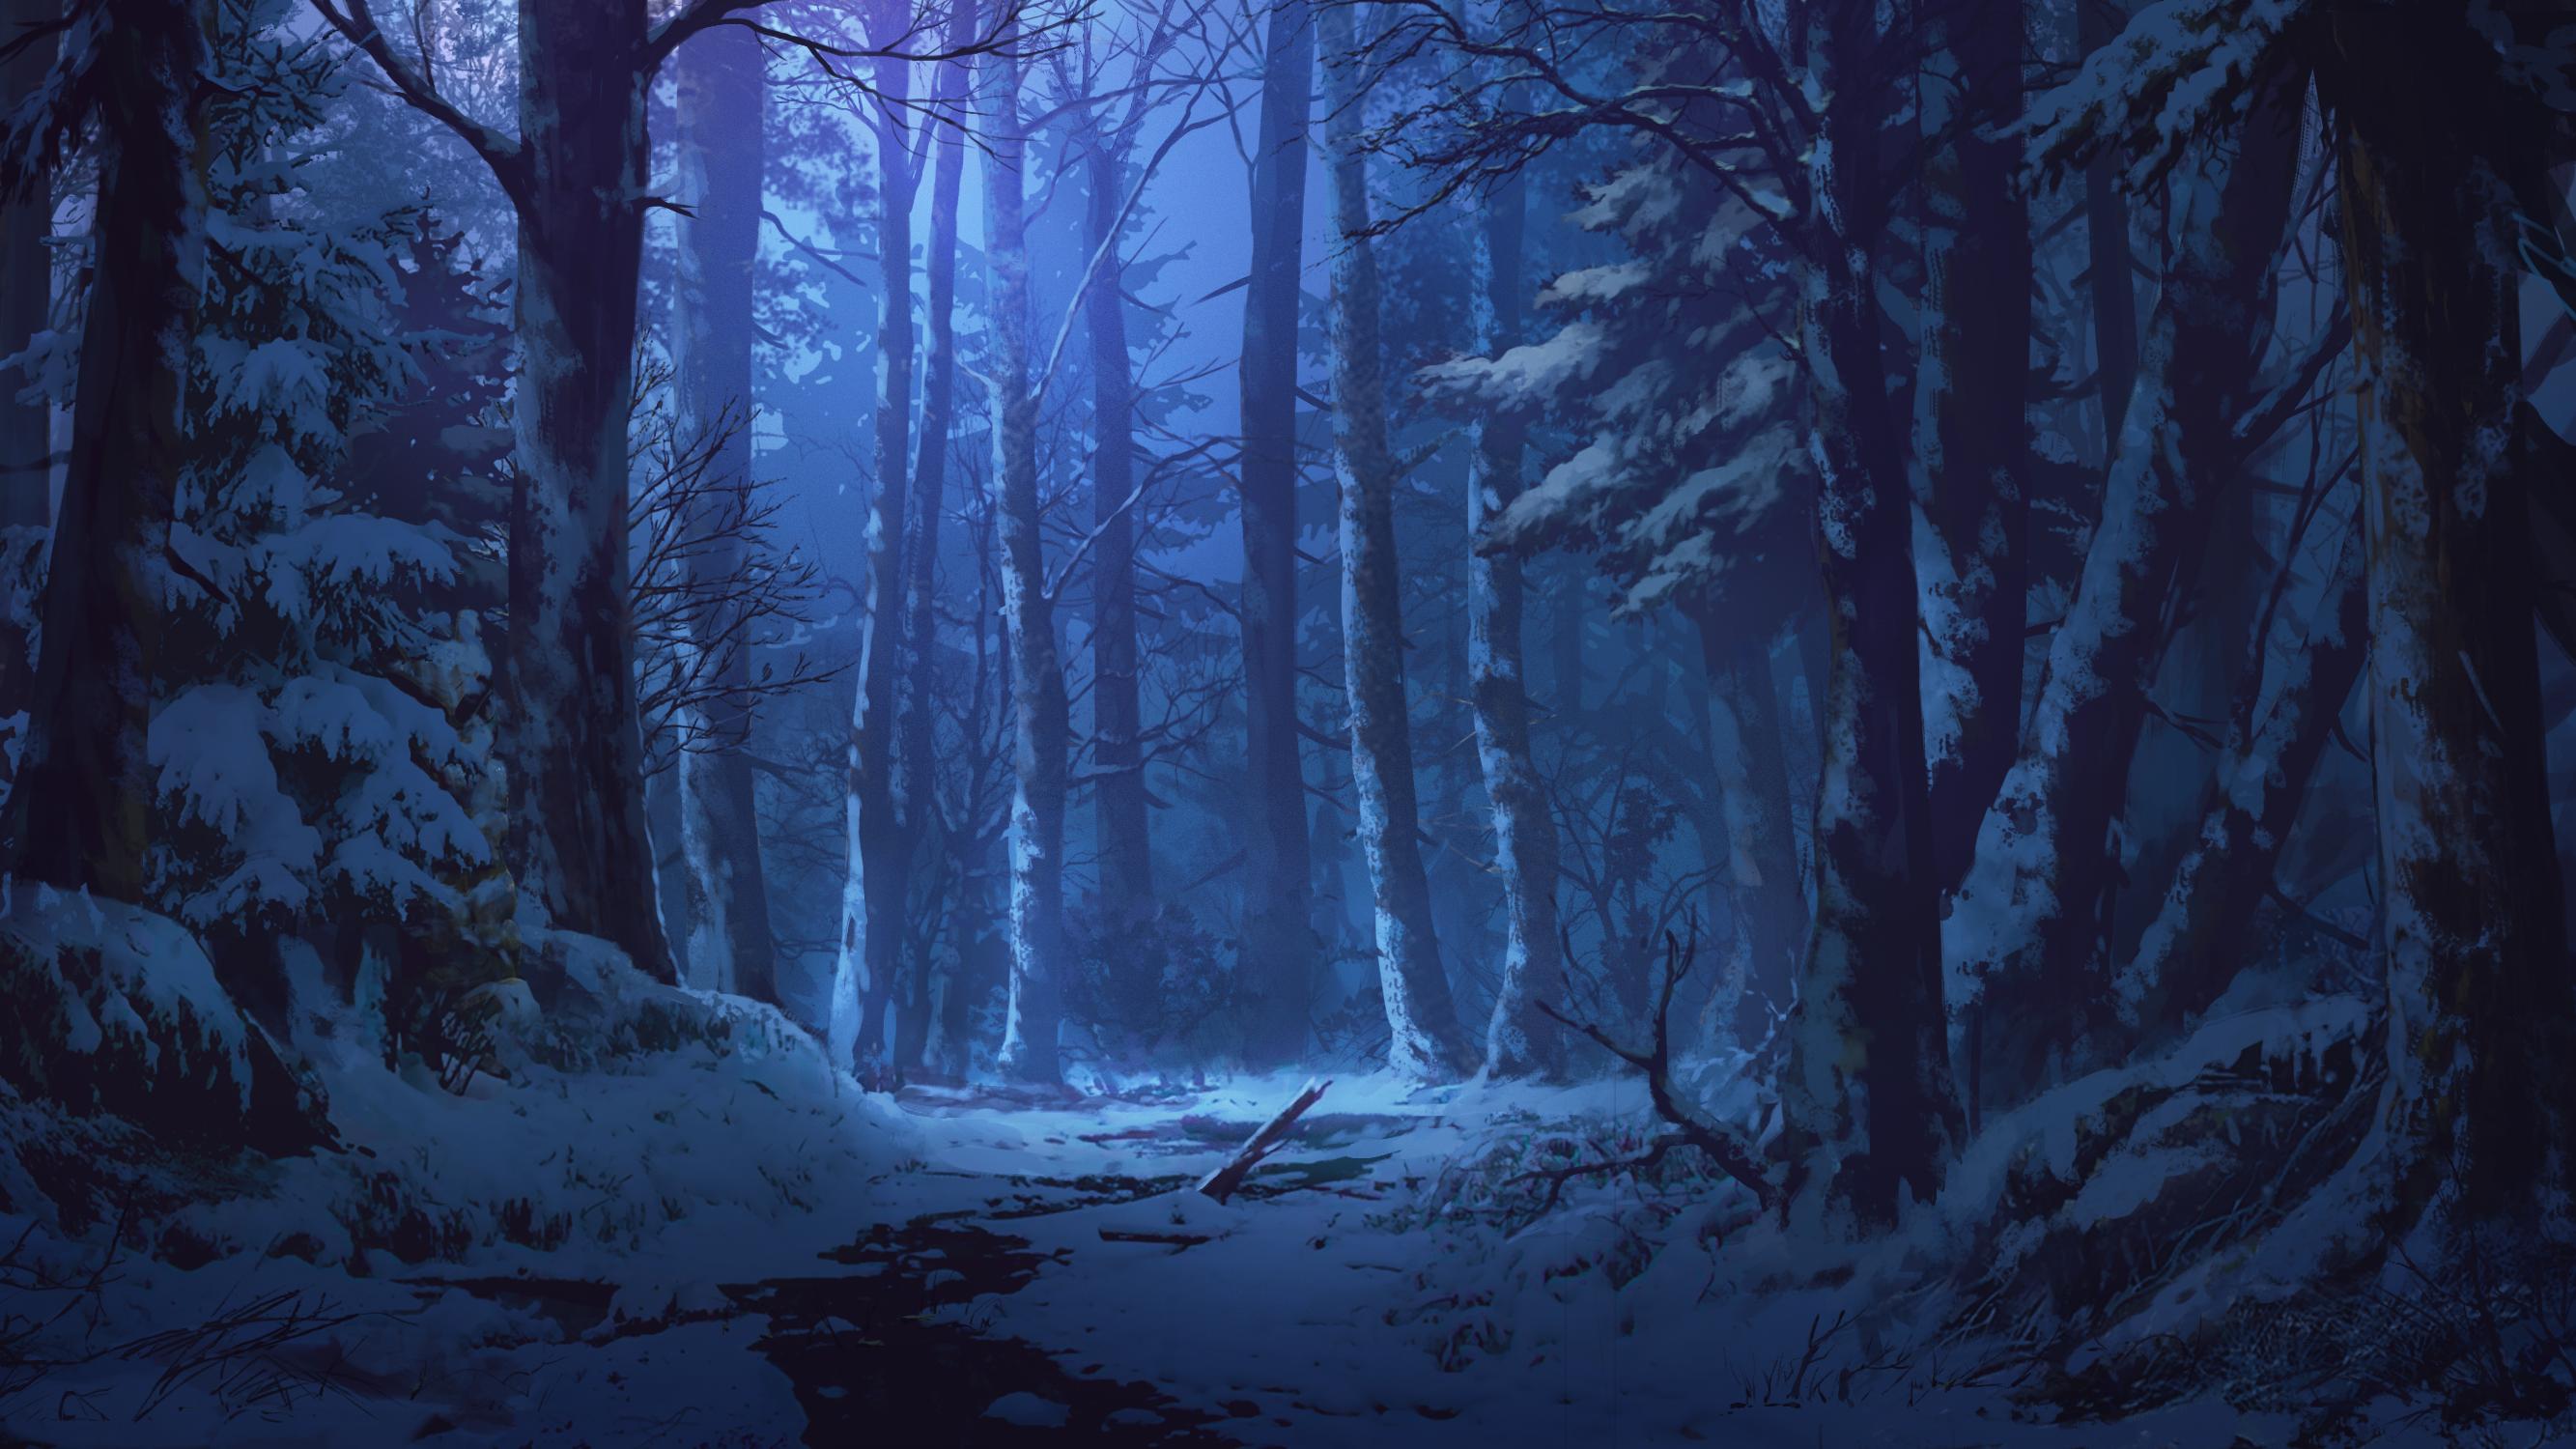 blue dao dao dark forest night nobody original scenic snow ...